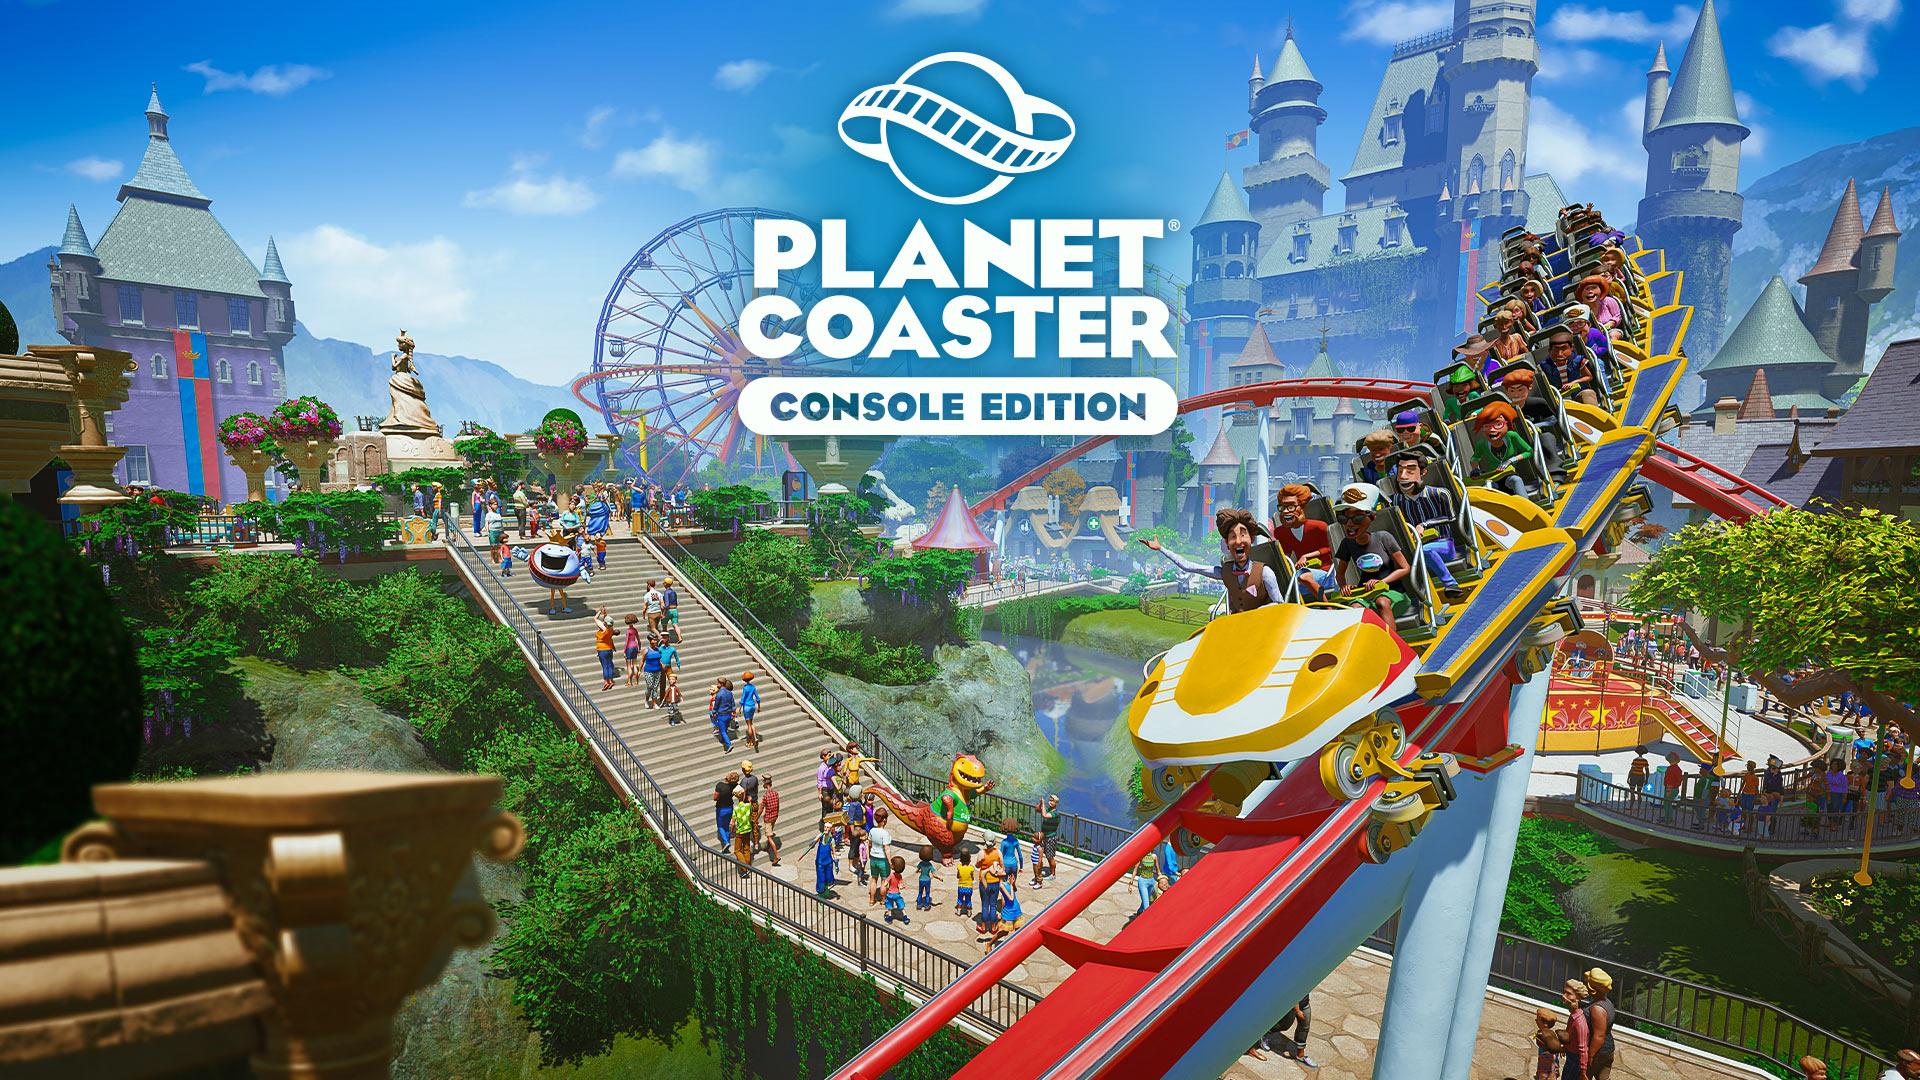 planet coaster console edition wallpaper 72239